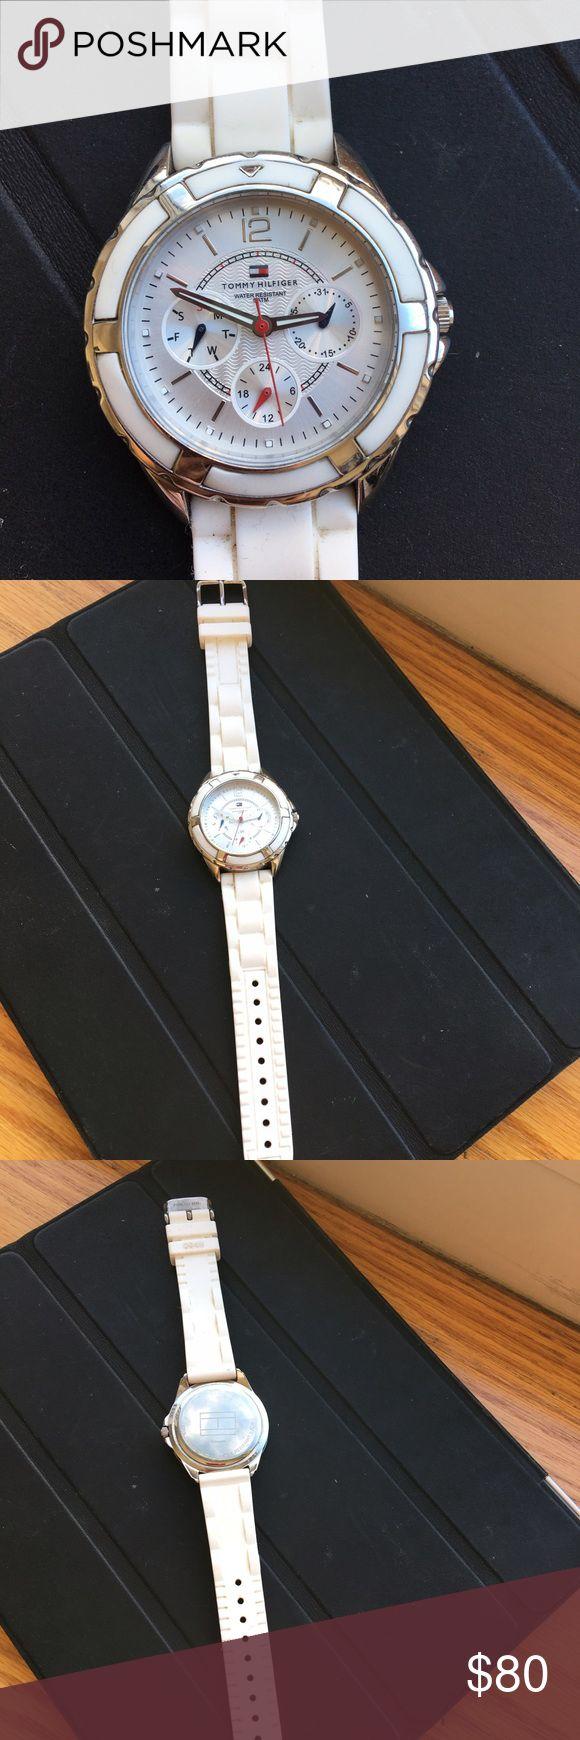 Tommy Hilfiger wrist watch Ladies Tommy Hilfiger wrist watch in white color. Tommy Hilfiger Other